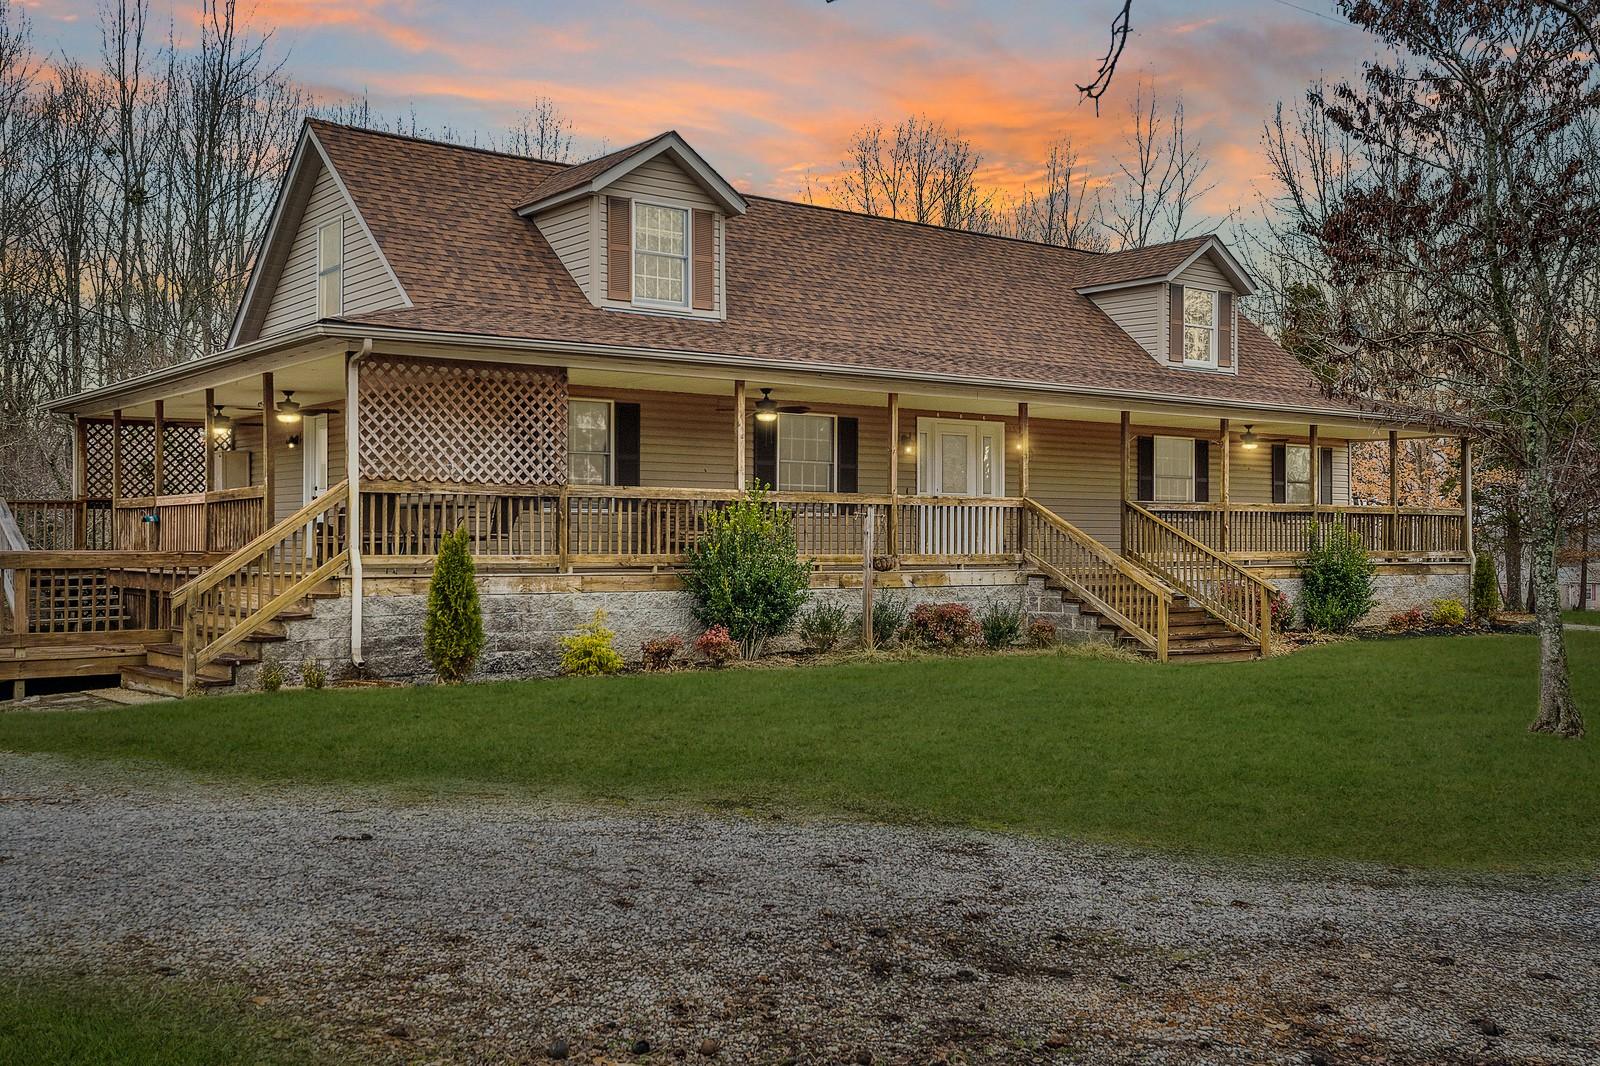 3431 Anderson Rd, Cedar Hill, TN 37032 - Cedar Hill, TN real estate listing